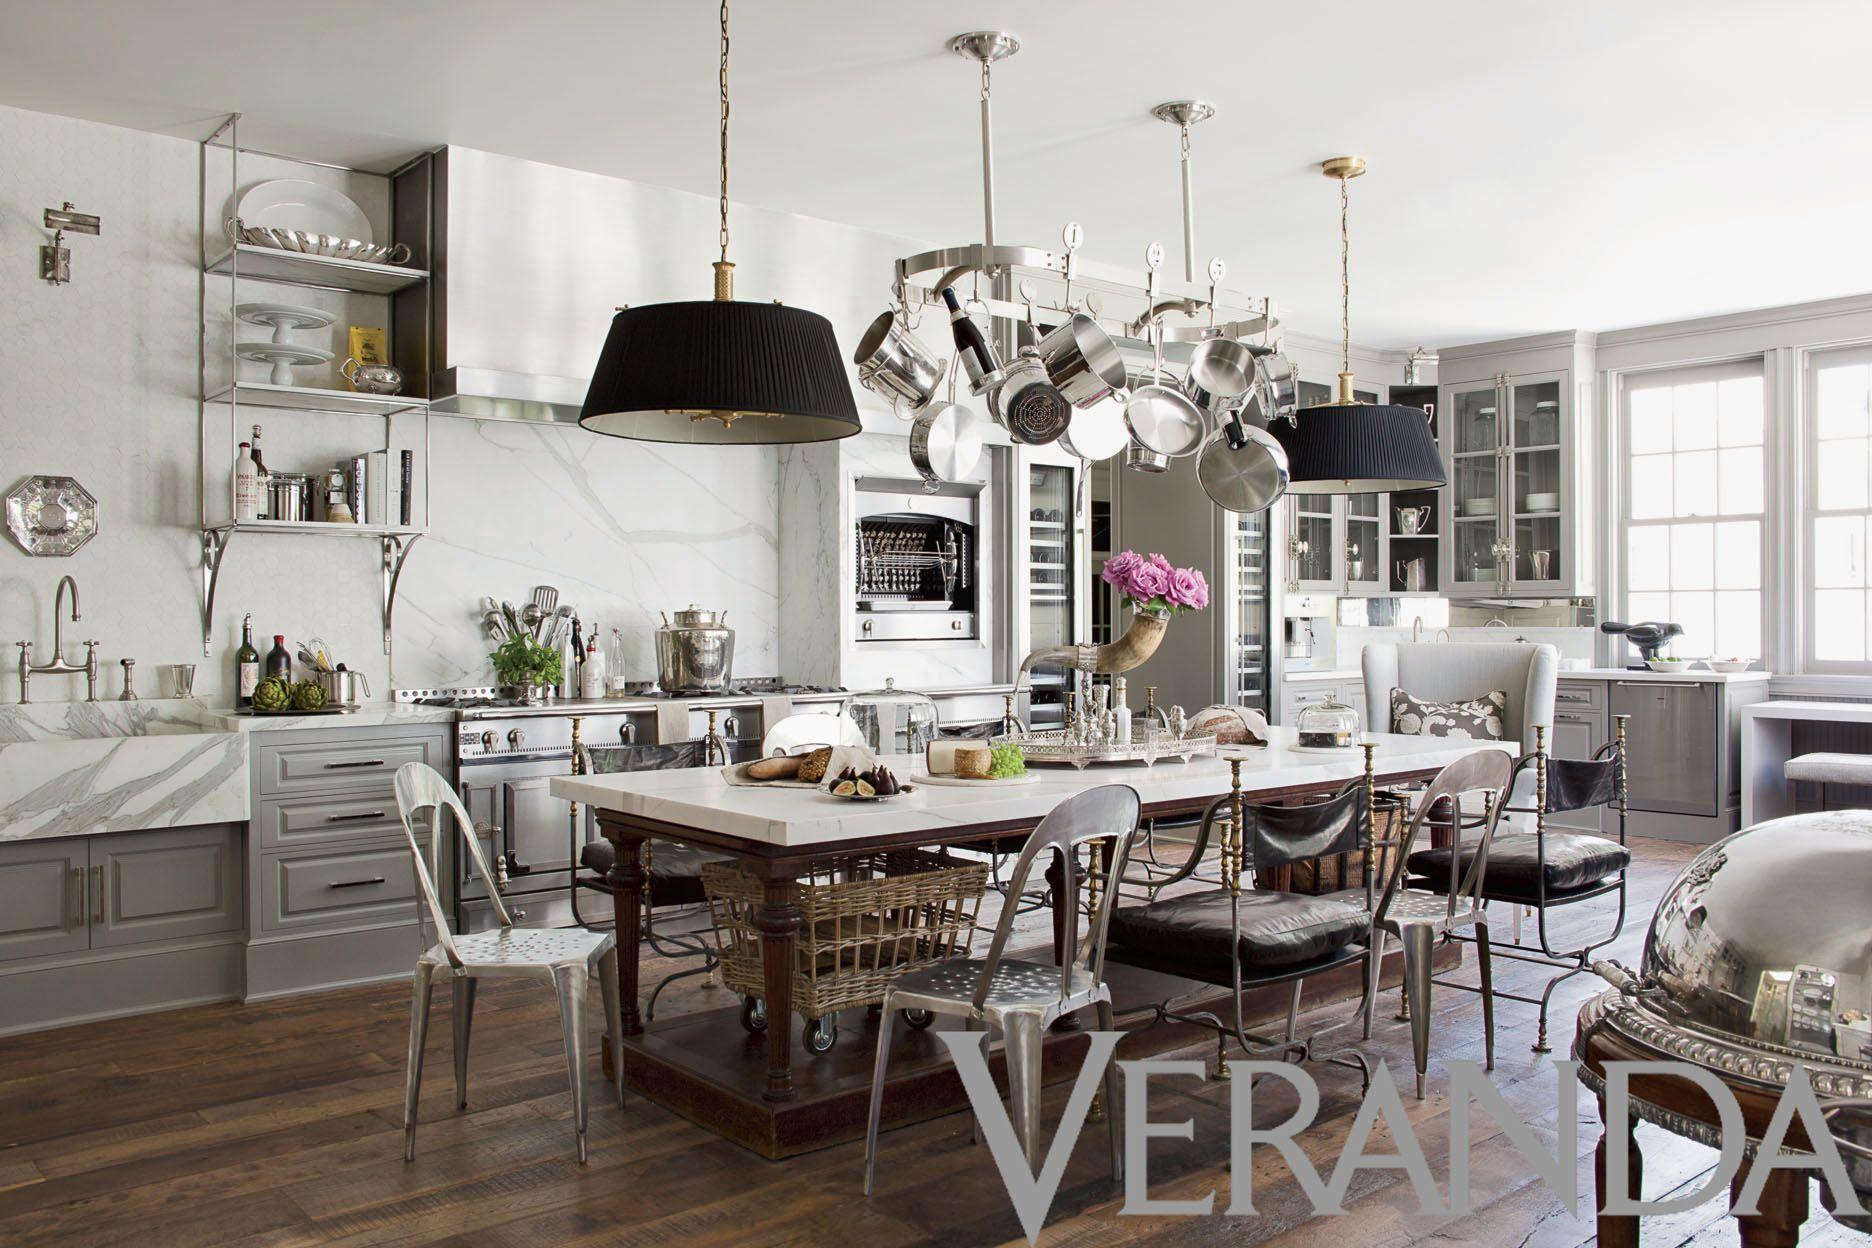 Pin By Veranda Magazine On Kitchens In Veranda Pinterest